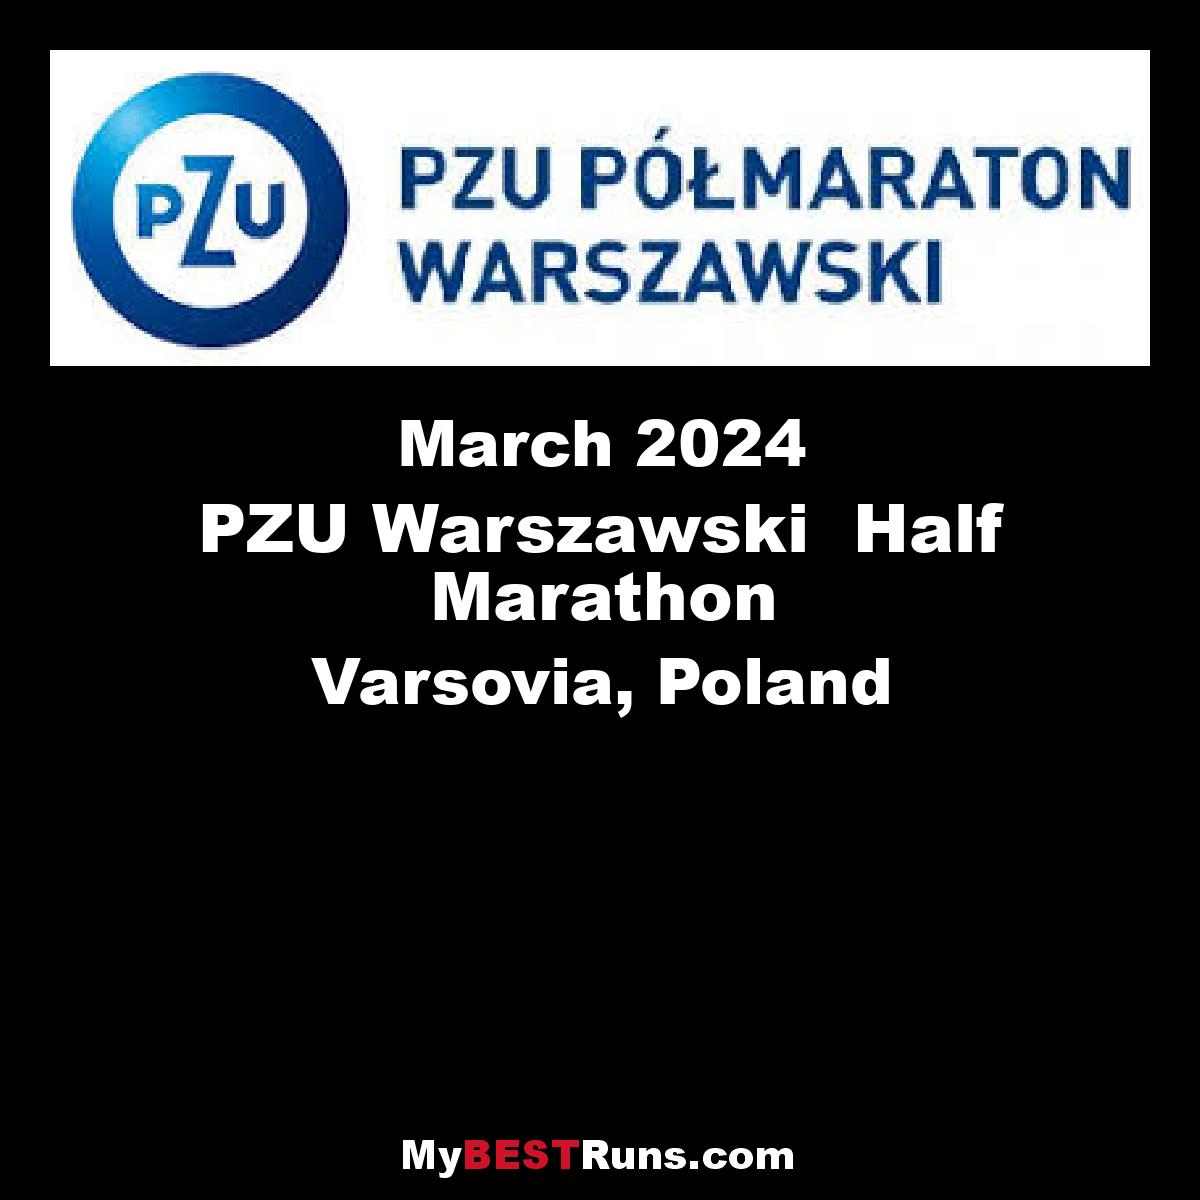 PZU Polmaraton Warszawski